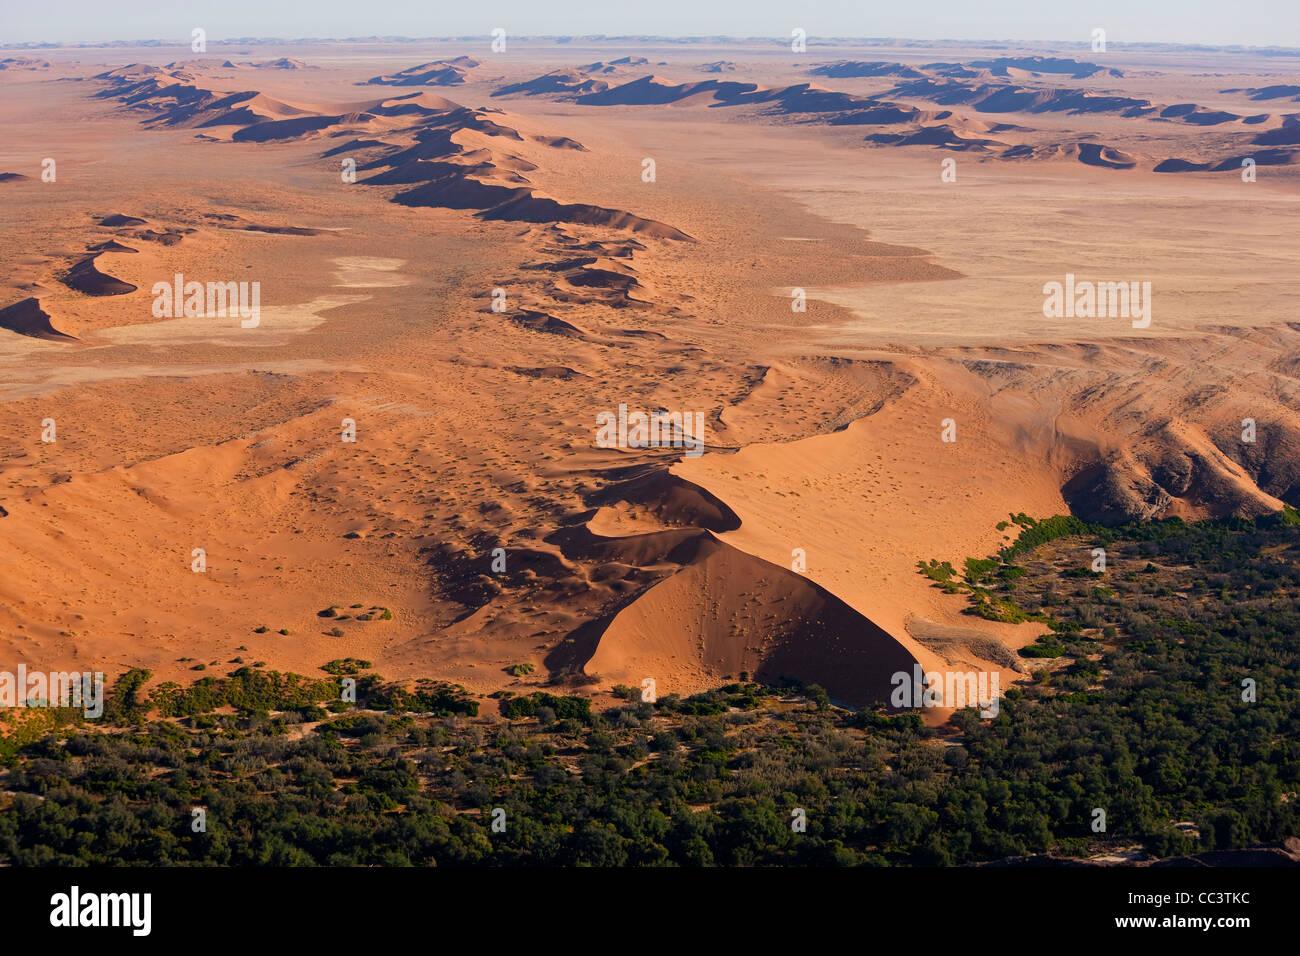 Desert meets green fertile land, Namib Desert, Namibia aerial view Stock Photo